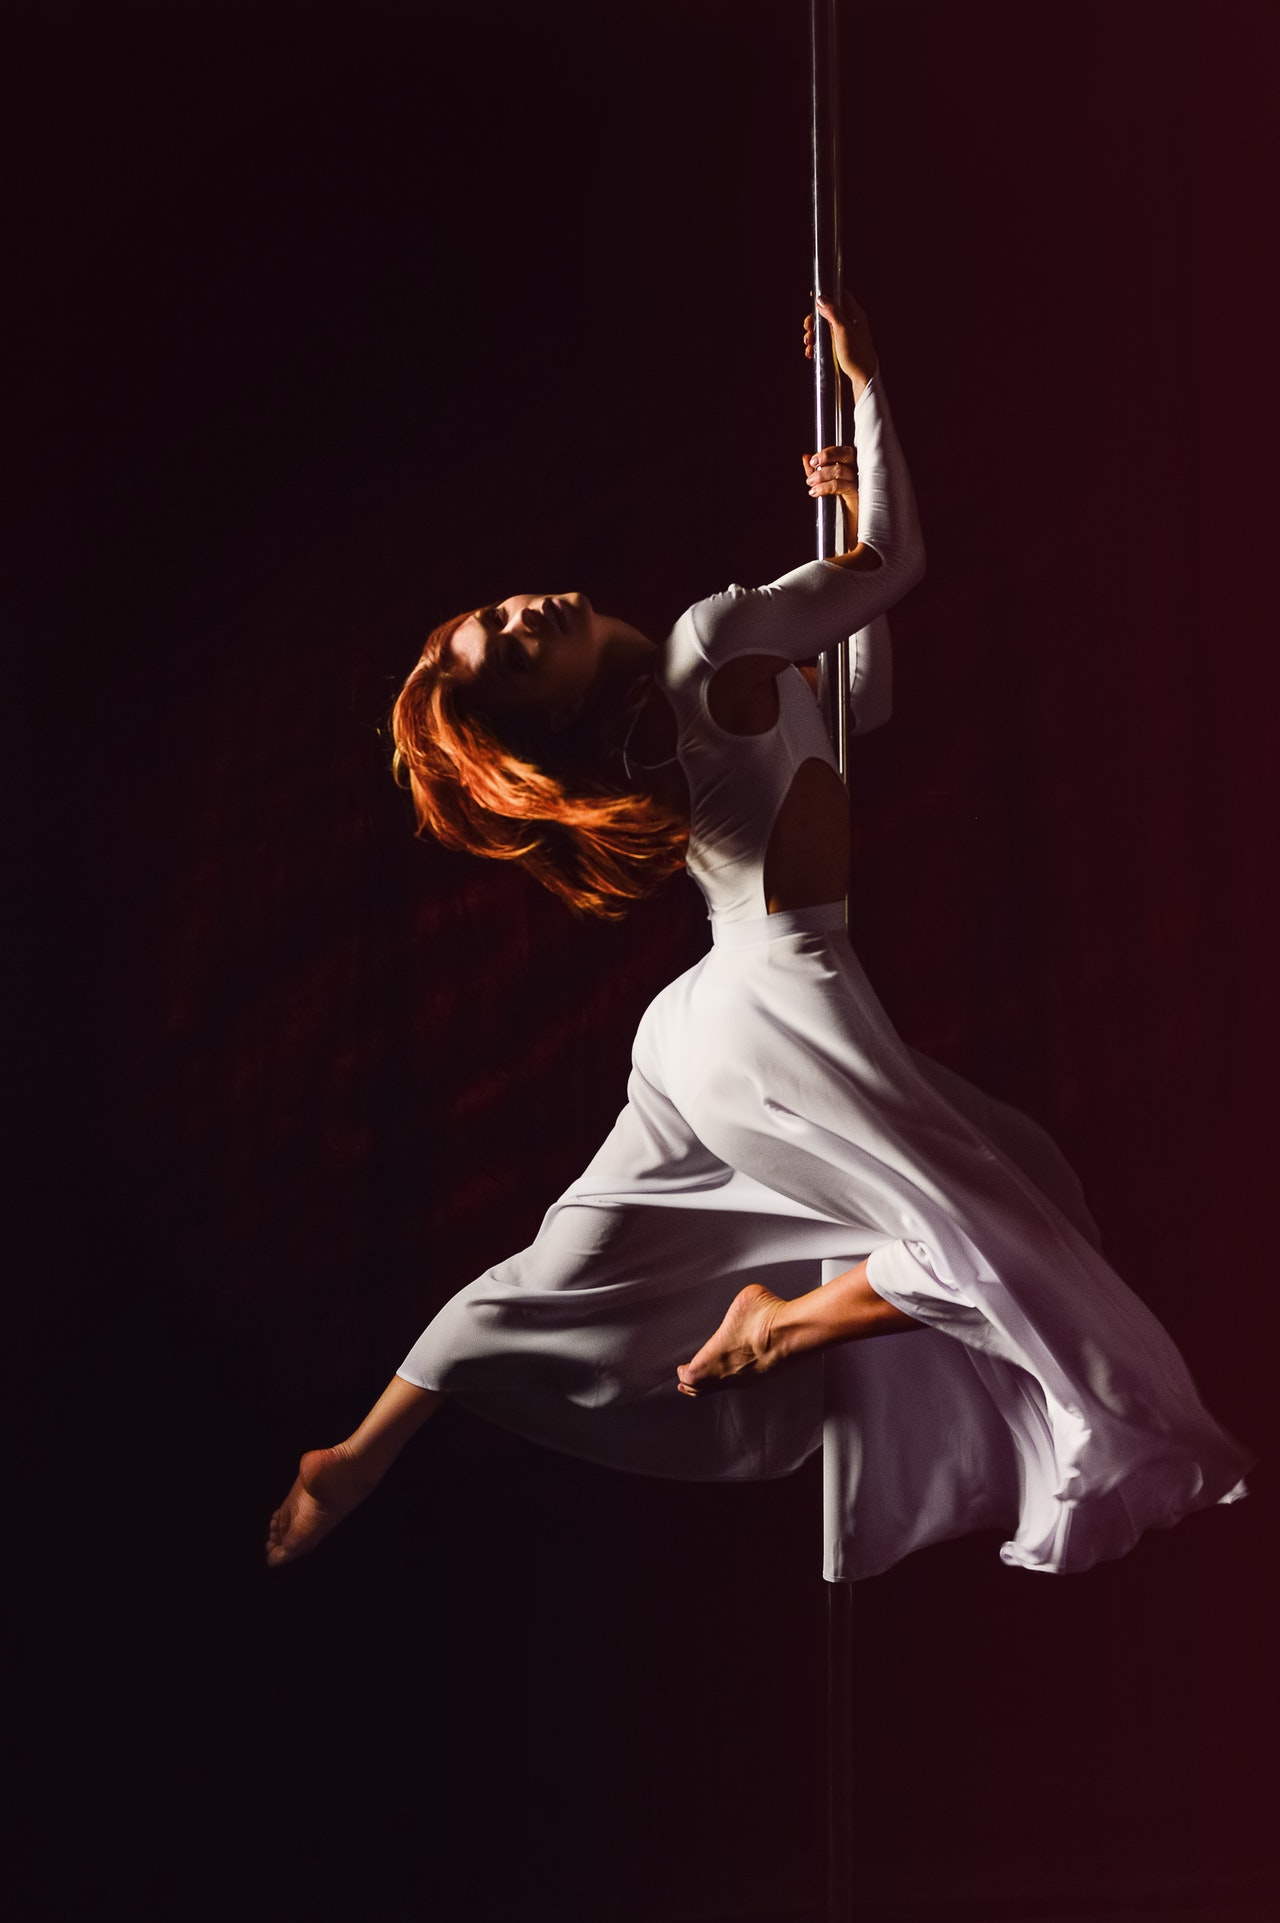 Woman in white dress pole dancing